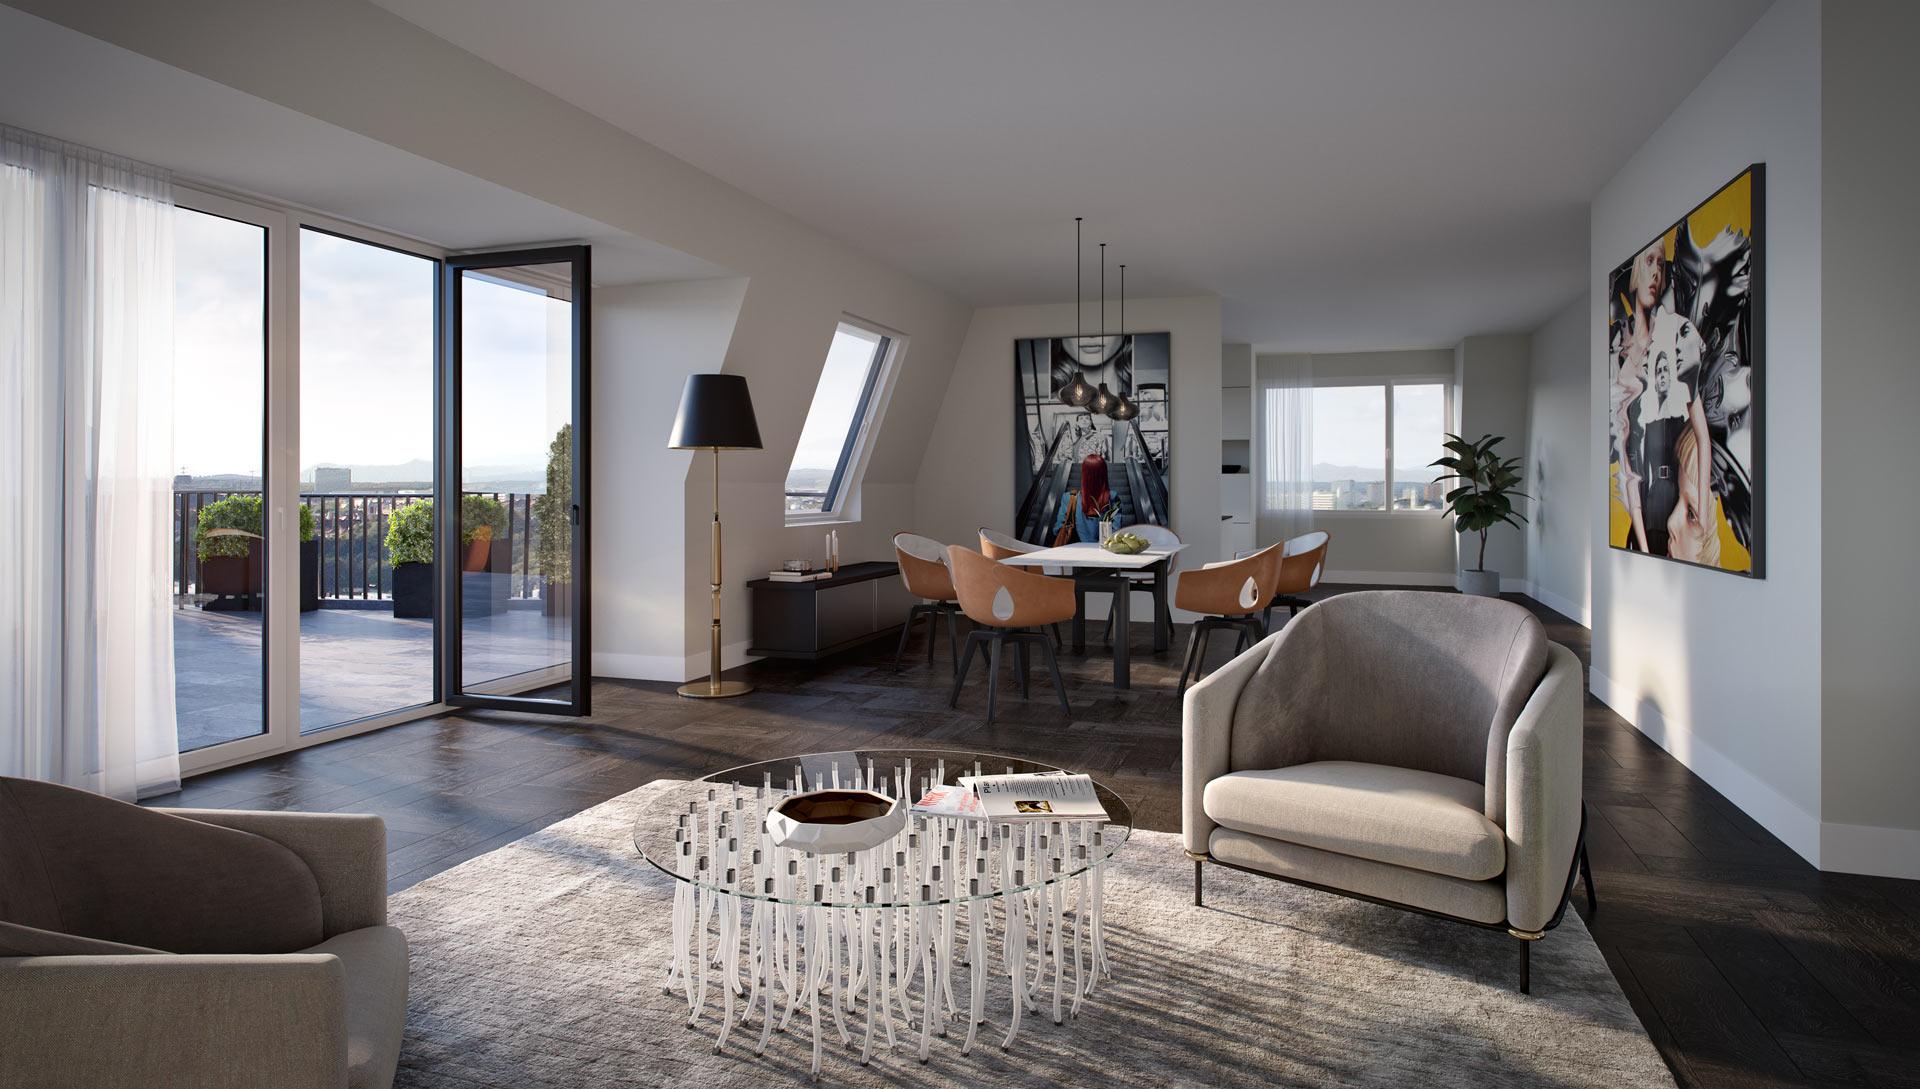 Innenvisualisierung - Bavaria Penthouses